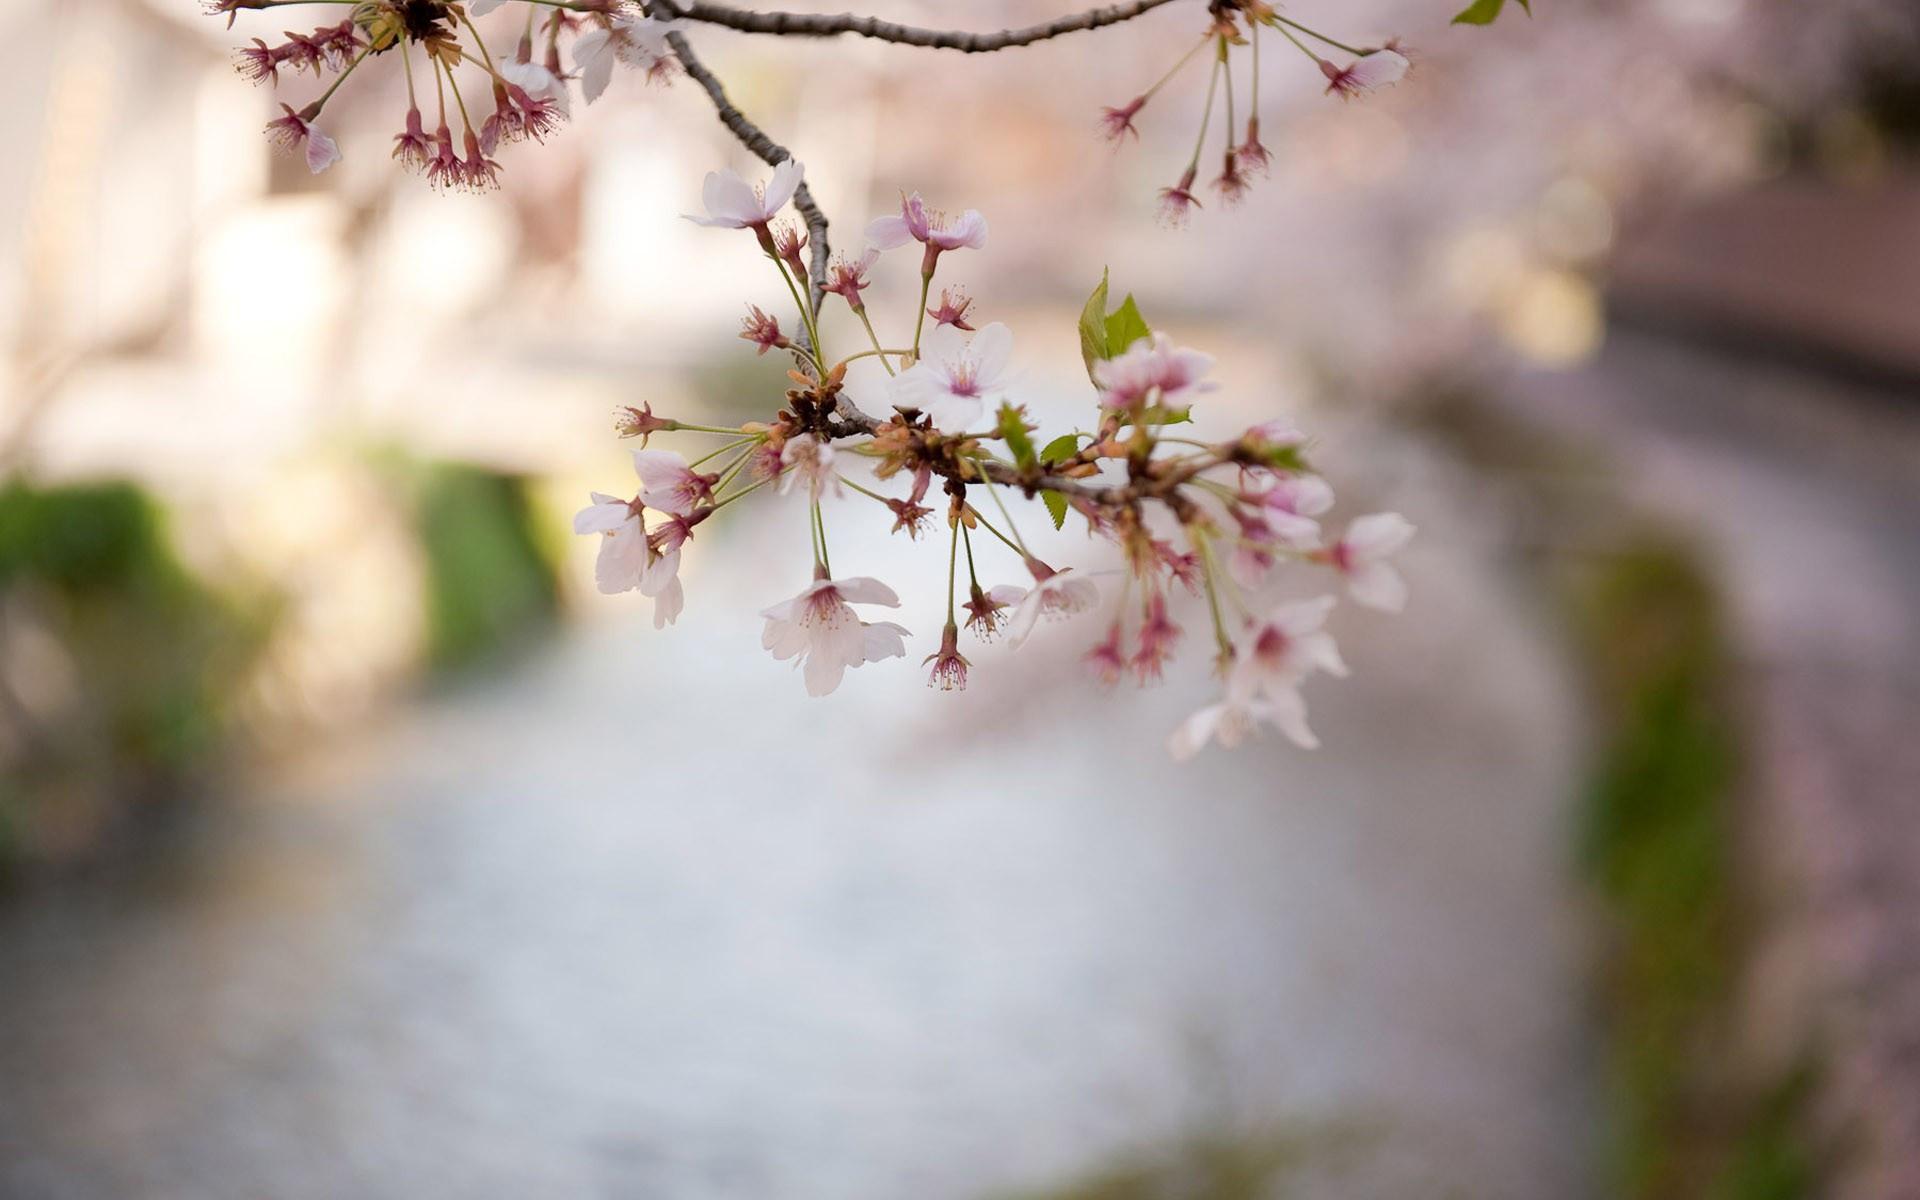 Cherry Blossom Windows Wallpaper - WallpaperSafari